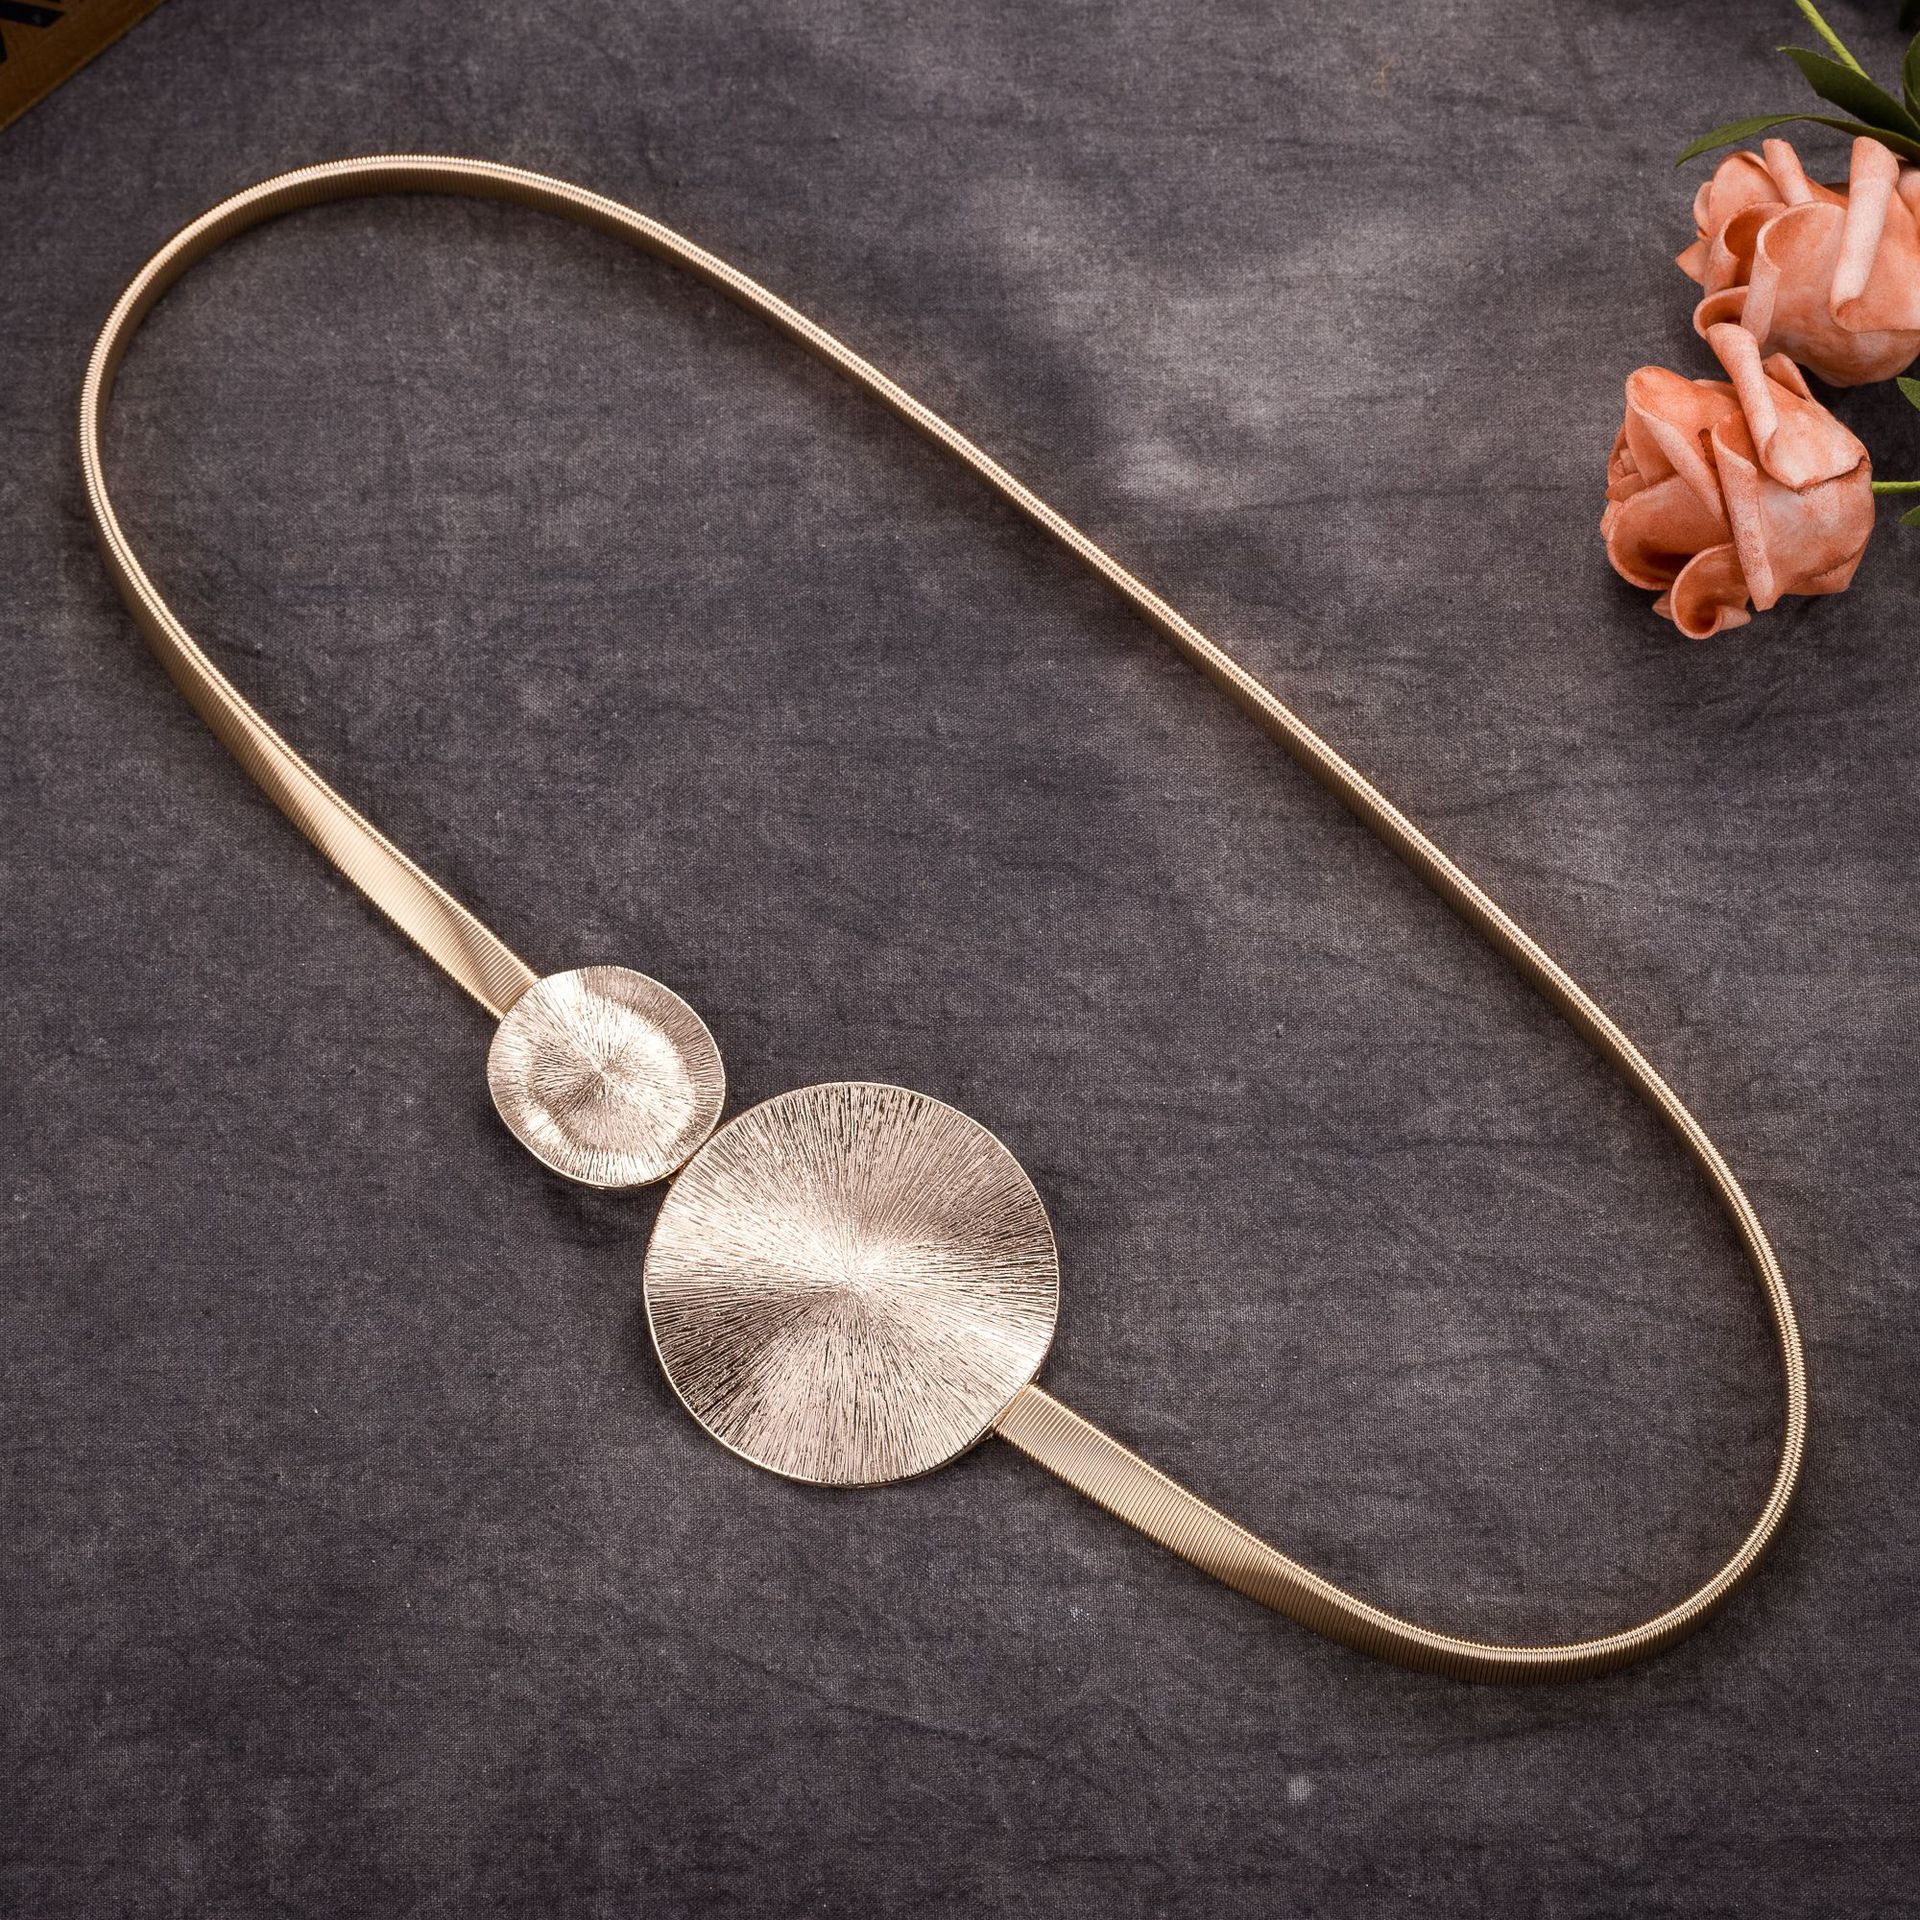 Korean Elastic Metal Waist Silver Gold Chain Belts Female Round Leaf Buckle For Women Dresses Strap Waistband Cummerbunds